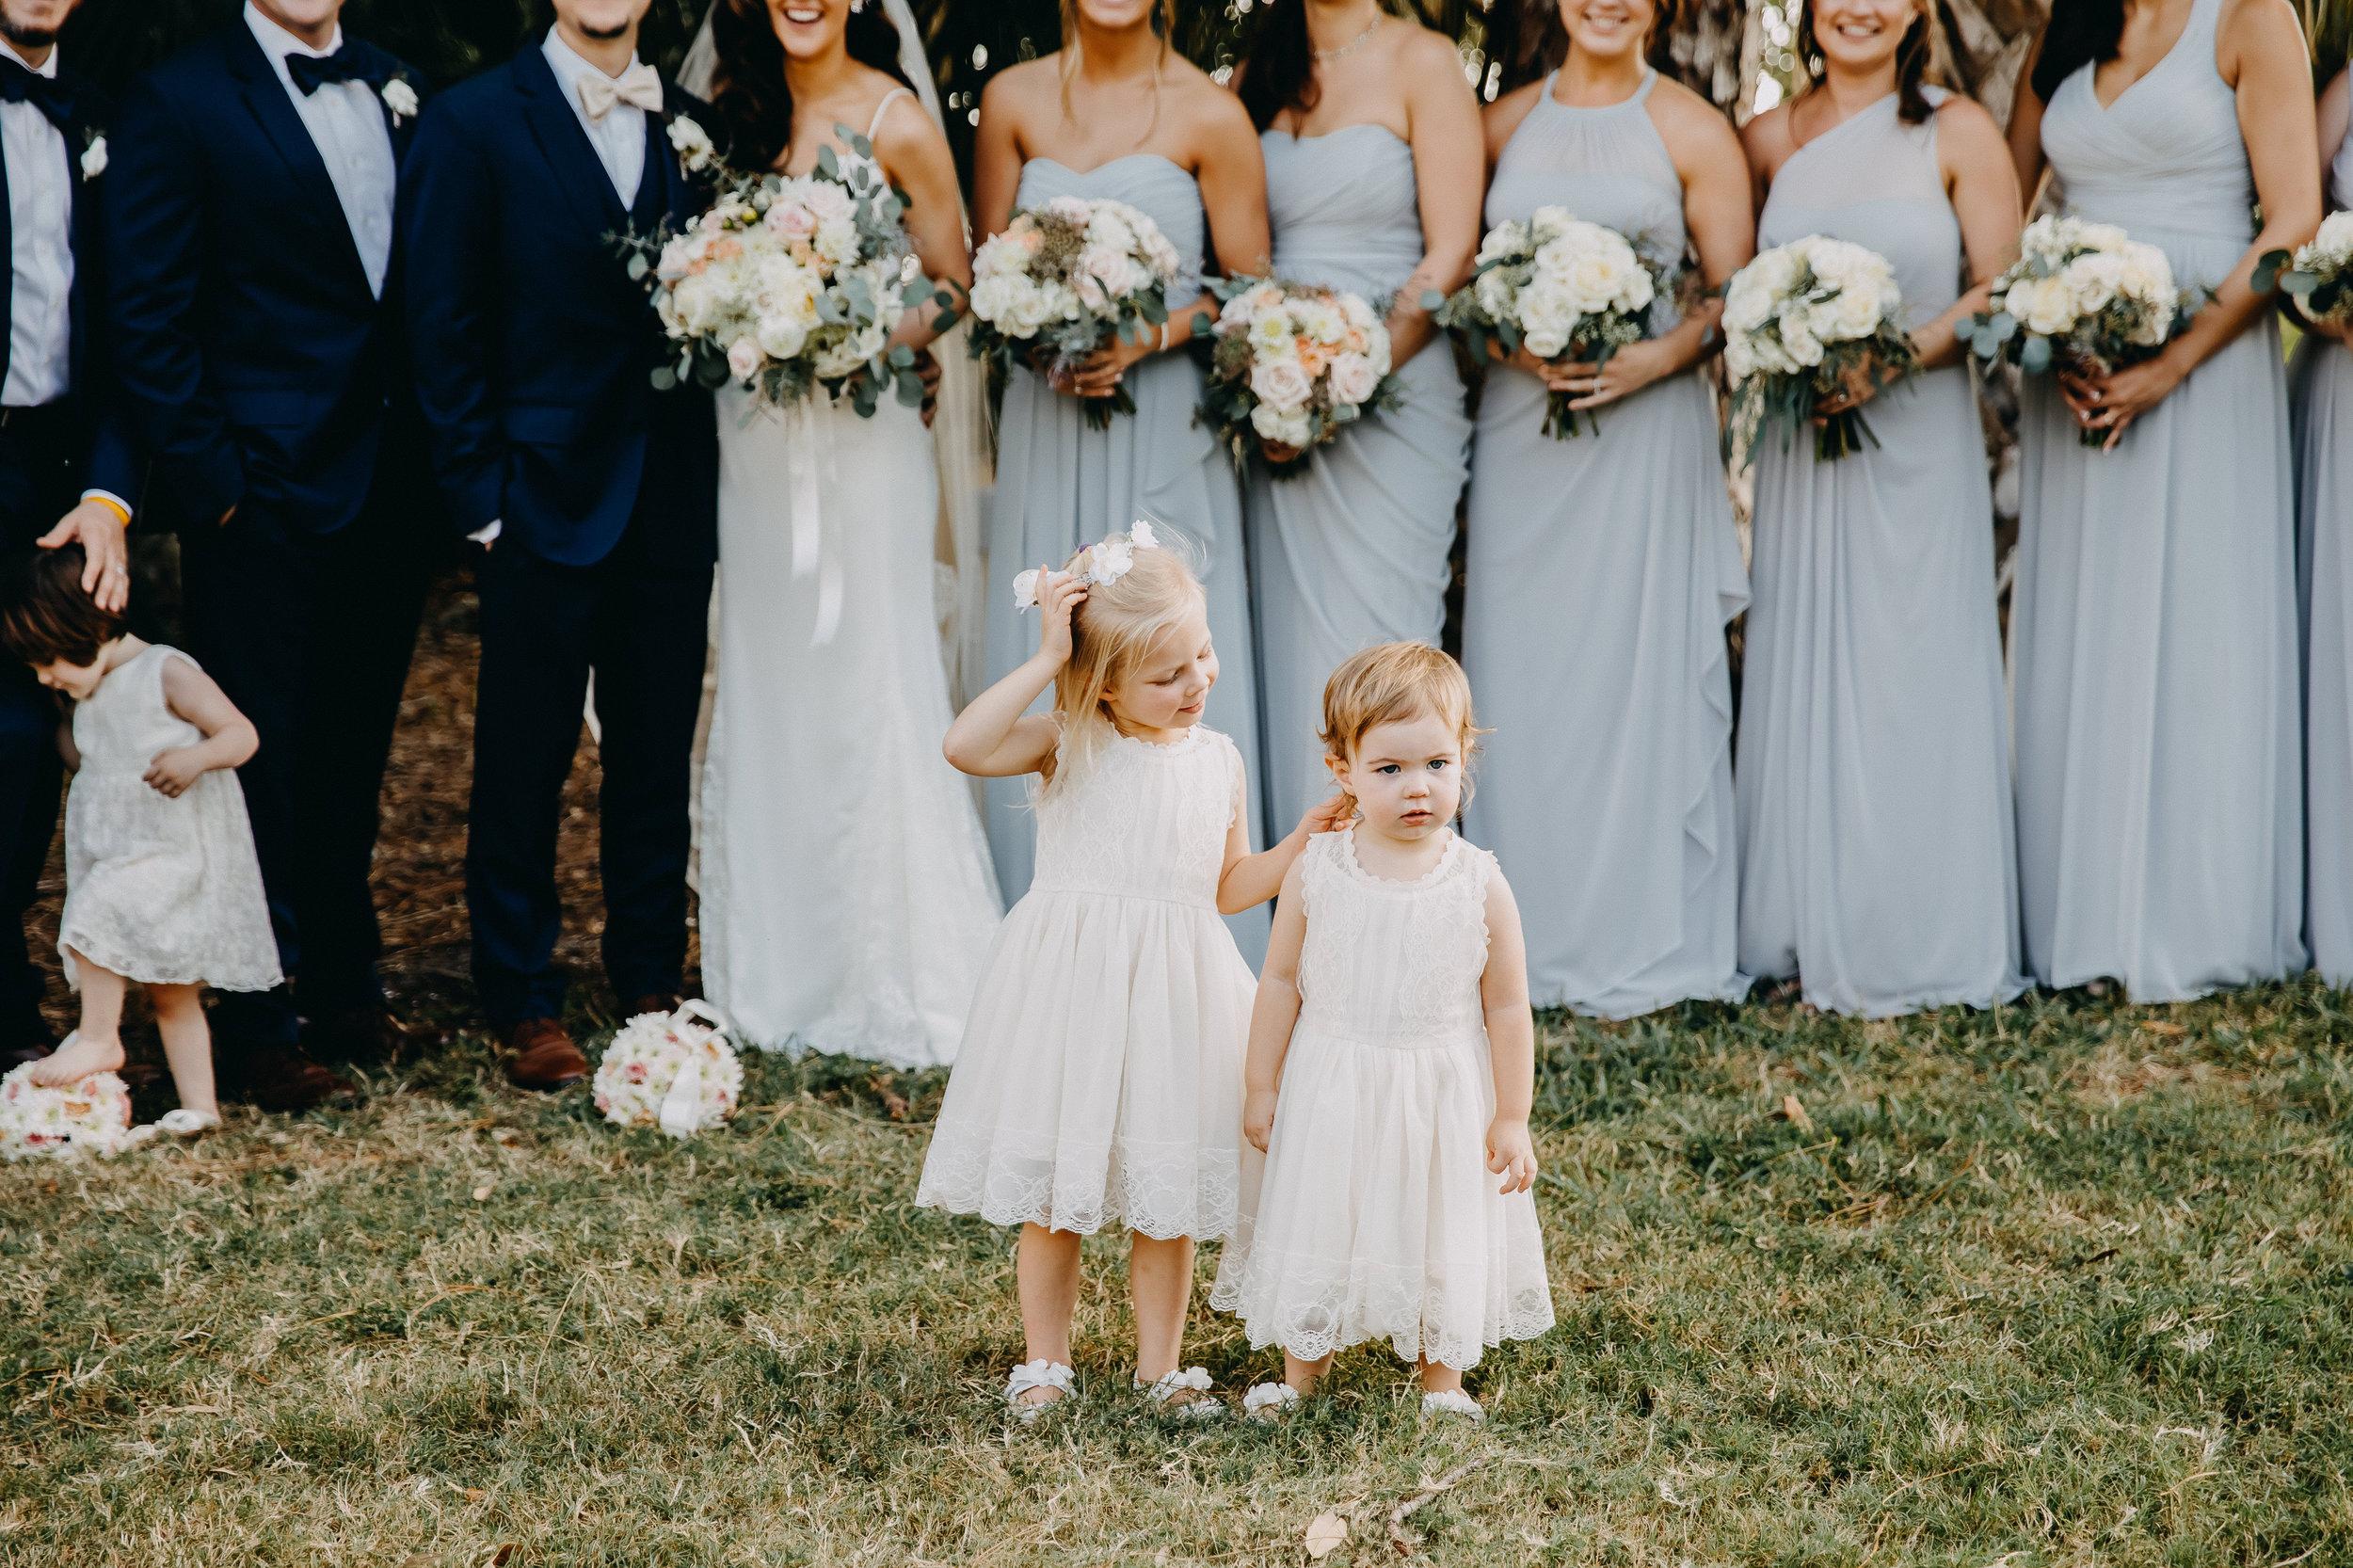 Cute Flower Girl Dresses - Florida Estate Wedding - Powel Crowley Estate Wedding